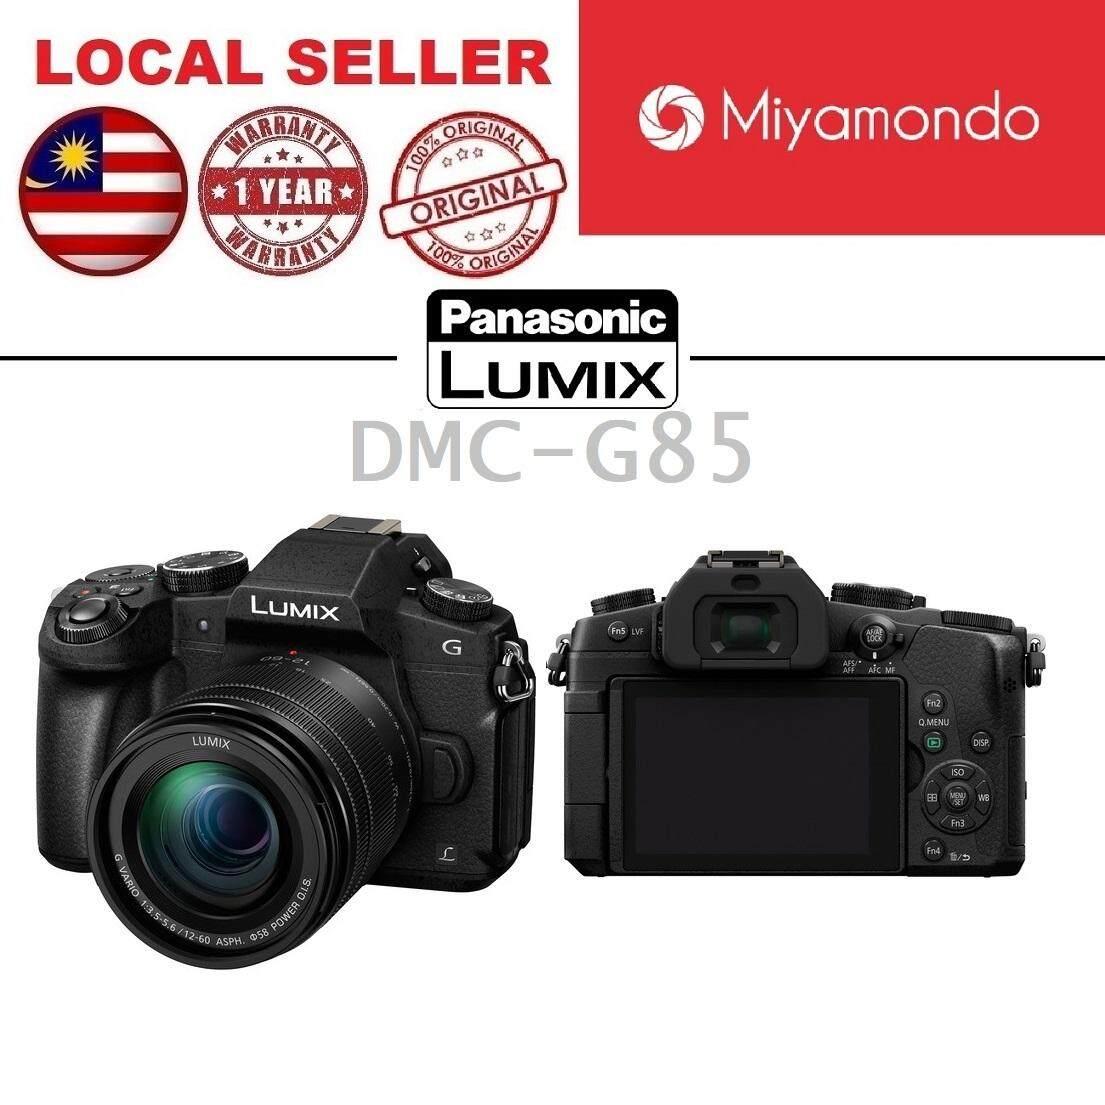 Sell Panasonic Lumix Gf9k Cheapest Best Quality My Store G 25mm F17 Asph Lens Myr 4490